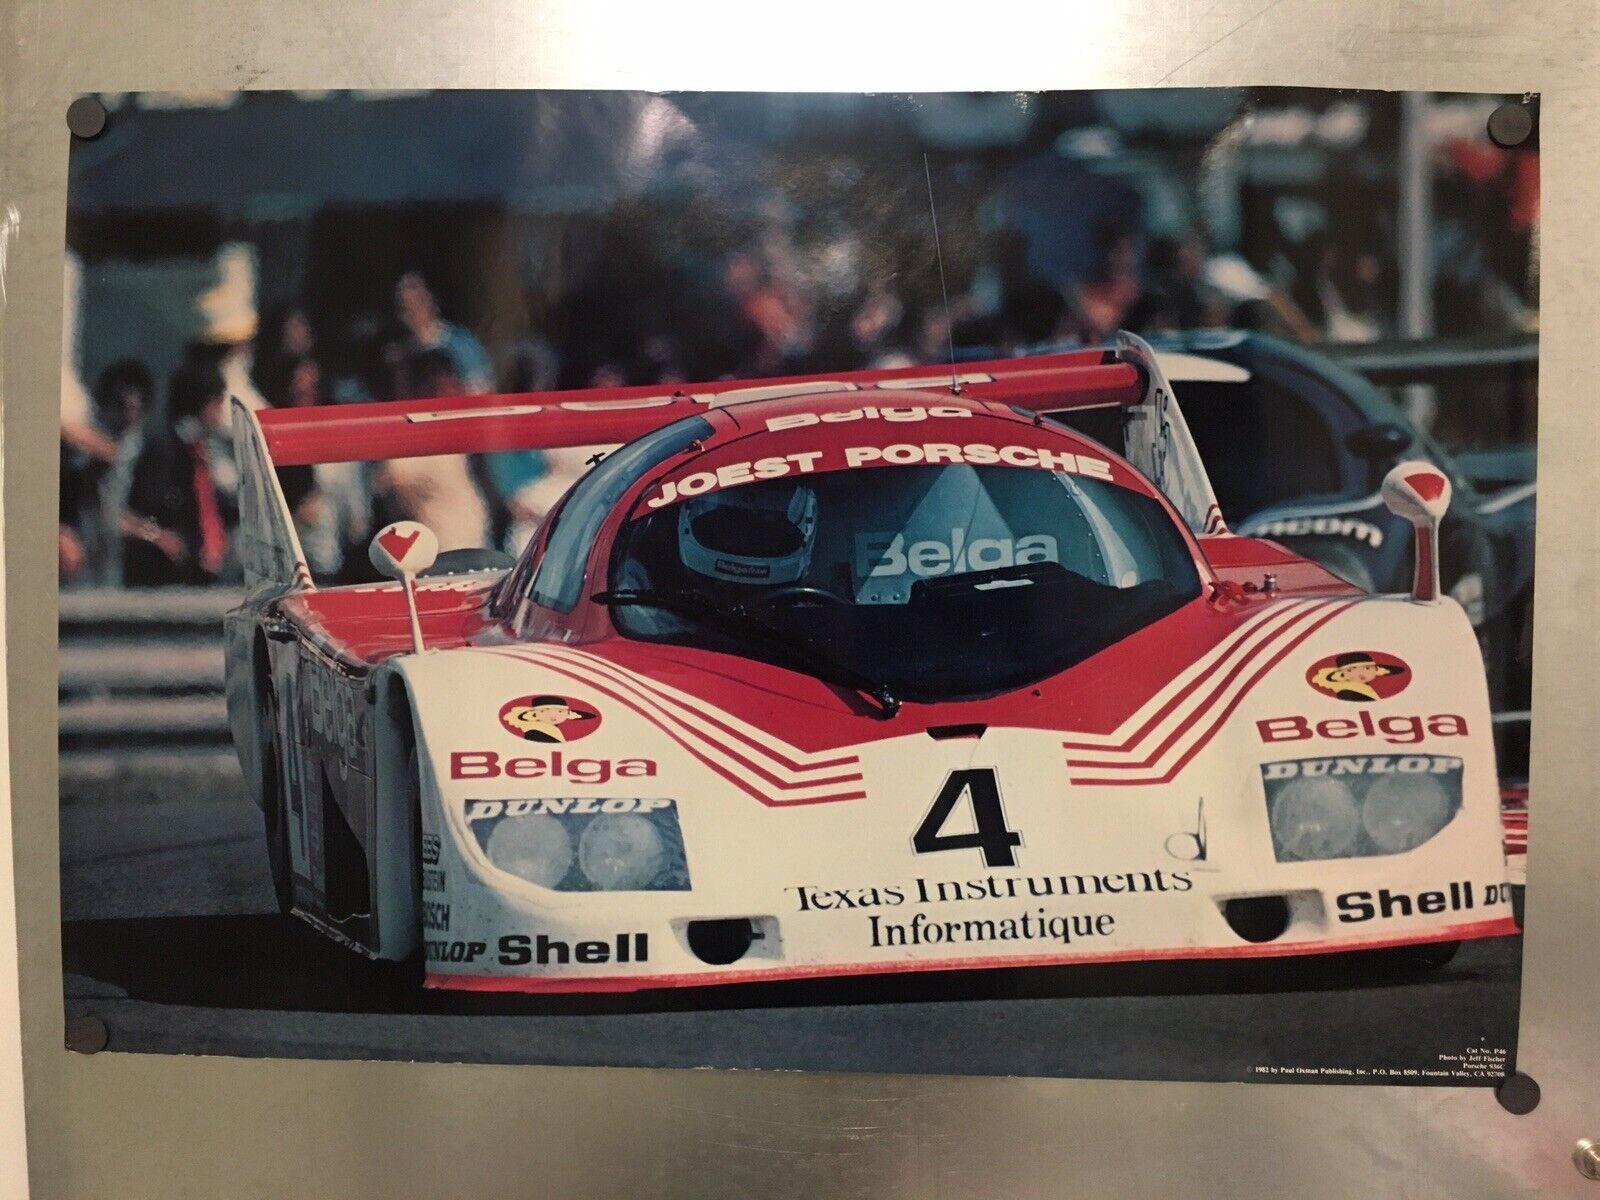 Vintage Porsche 936 C Racing Affiche  1982; Joest Porsche, Belga, Shell, etc.